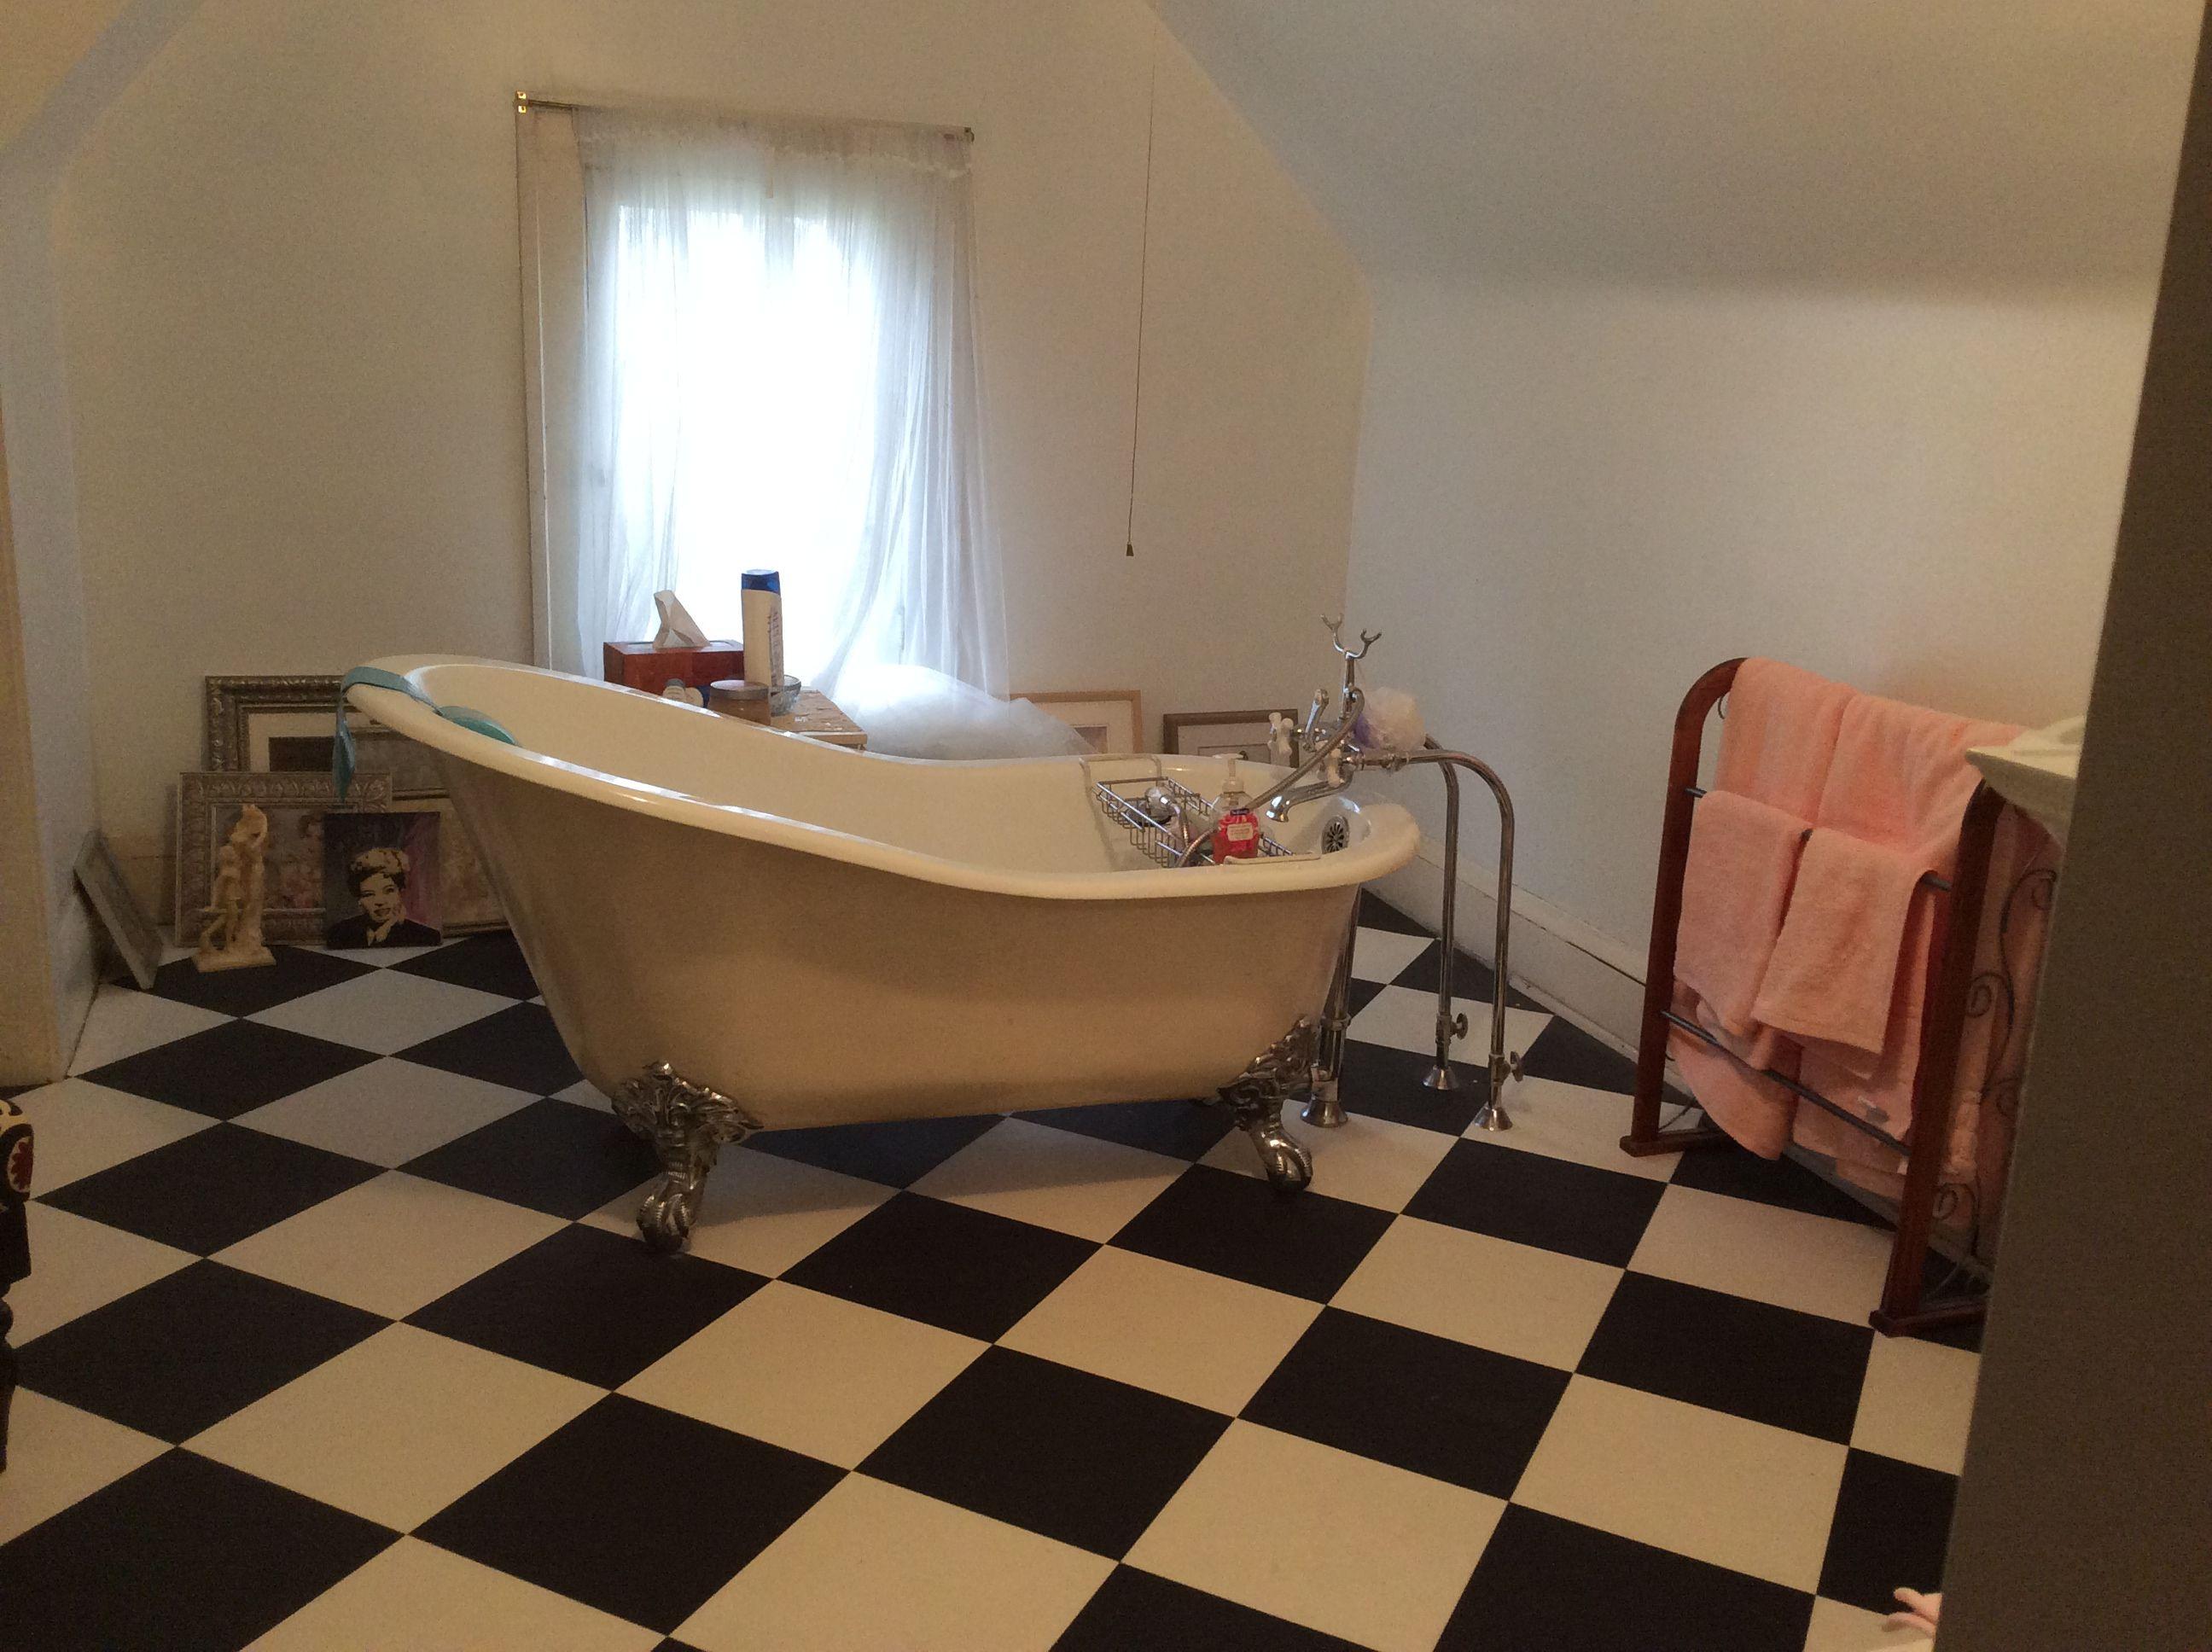 Third Floor Junk Storage Dump All Room Turned Into A Full Bath